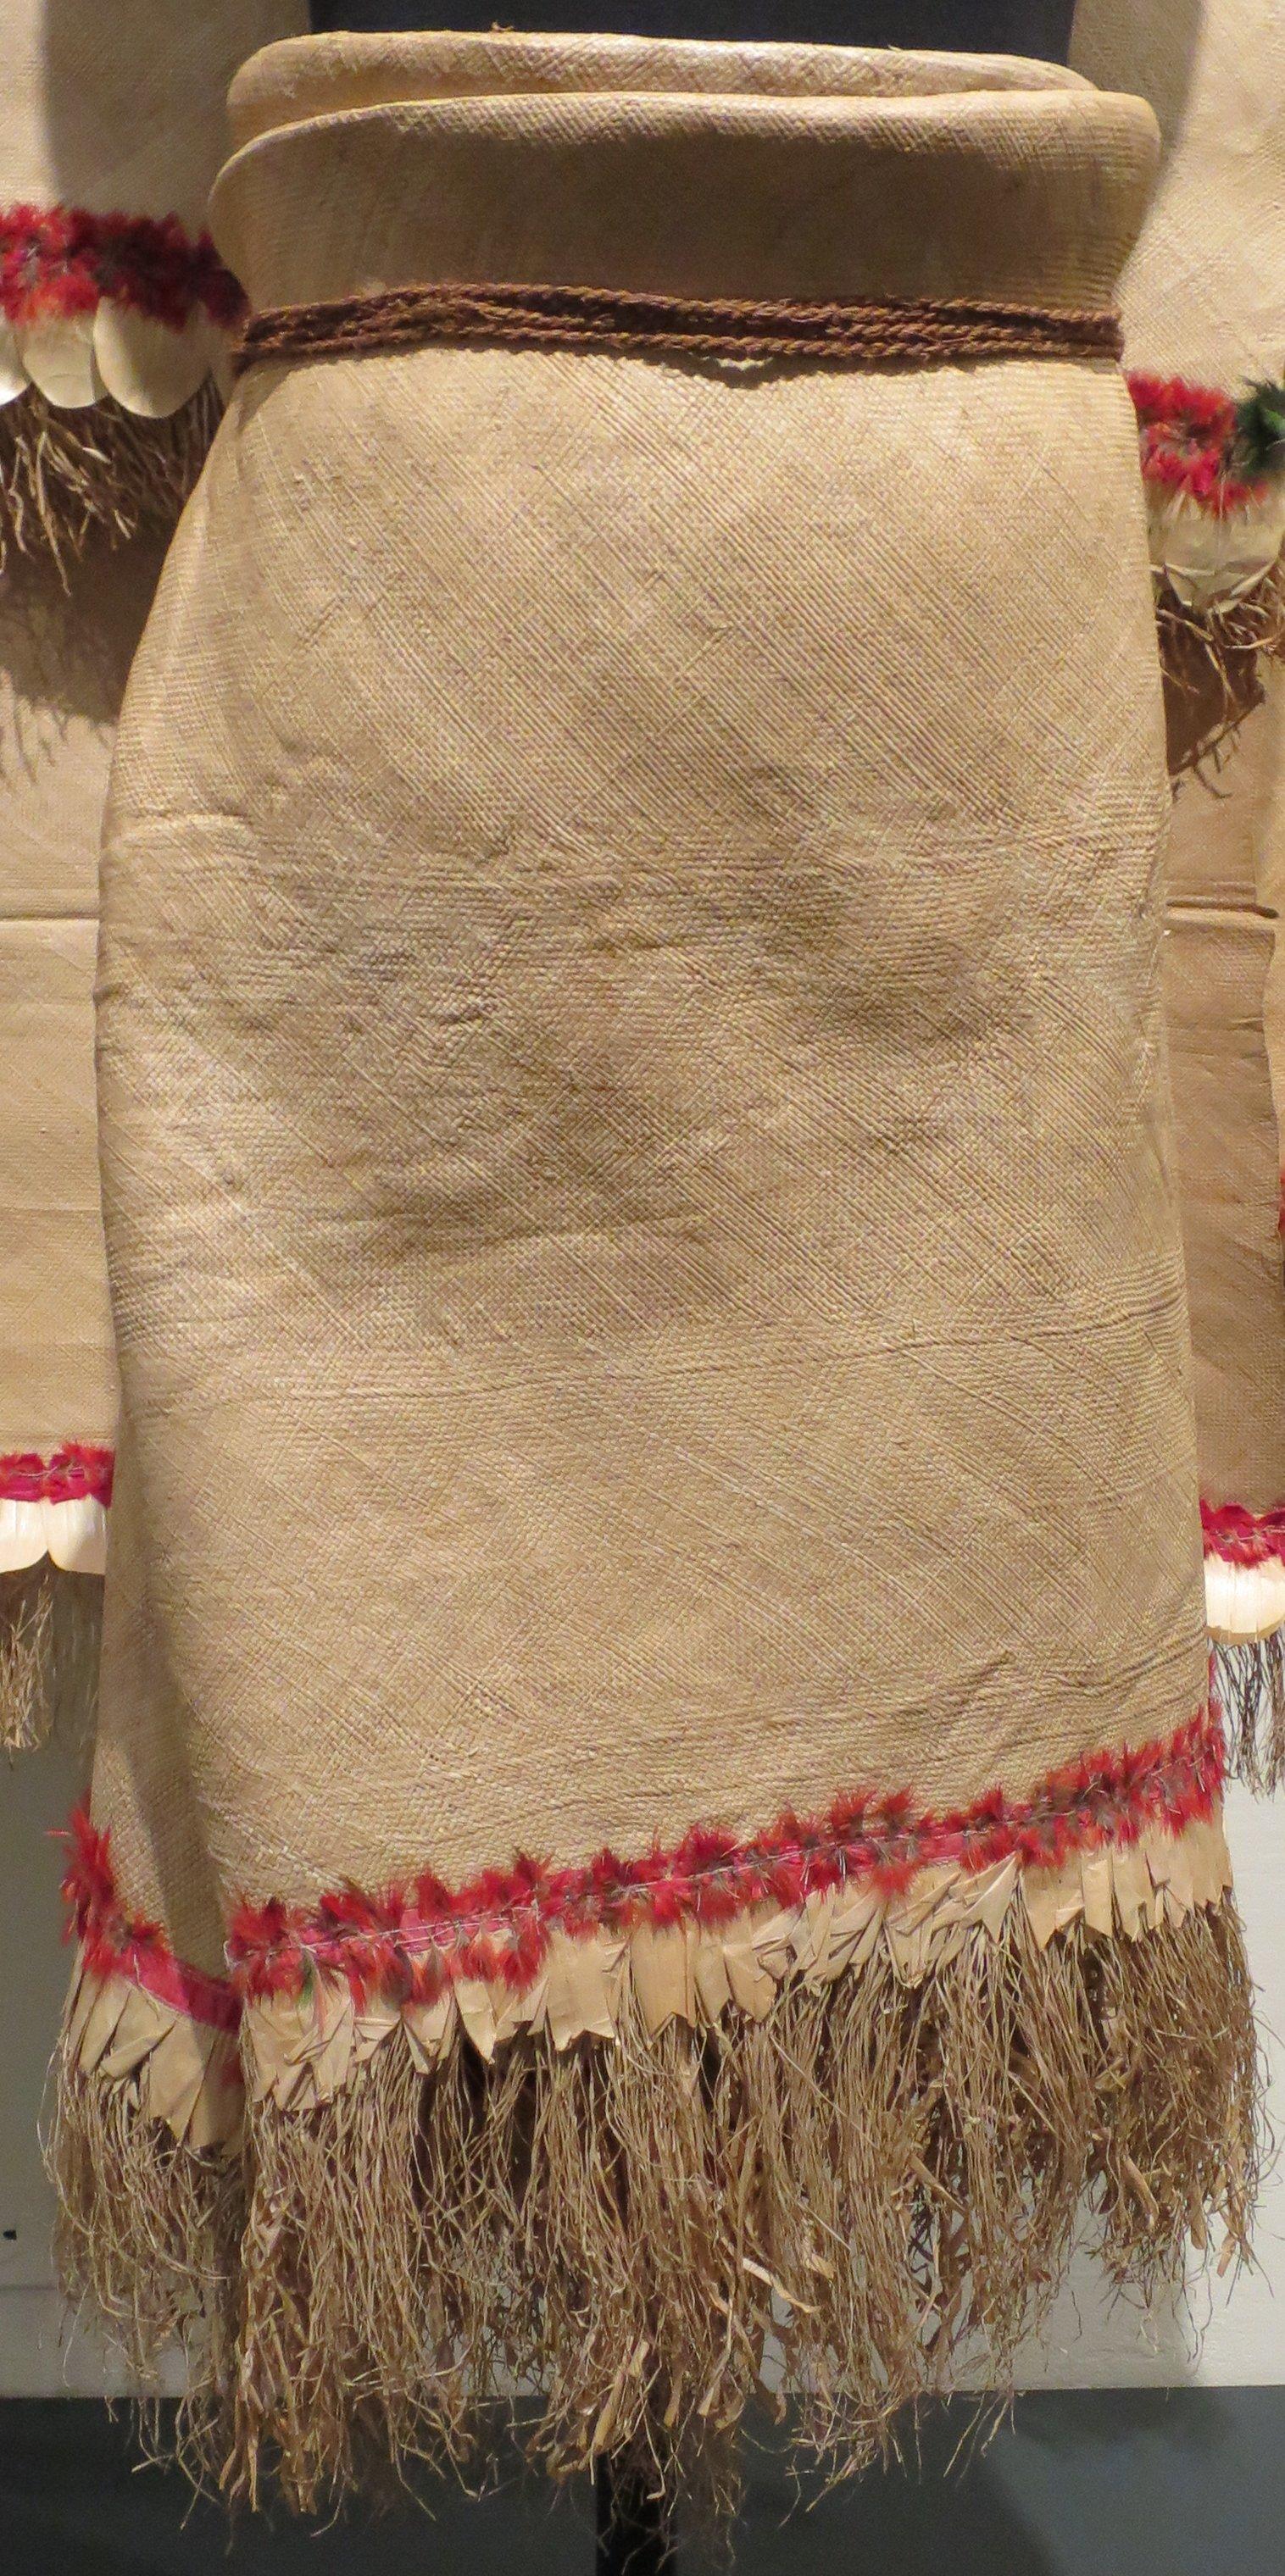 Museum Of Fine Art >> File:Fine mat from Samoa, Honolulu Museum of Art accession ...